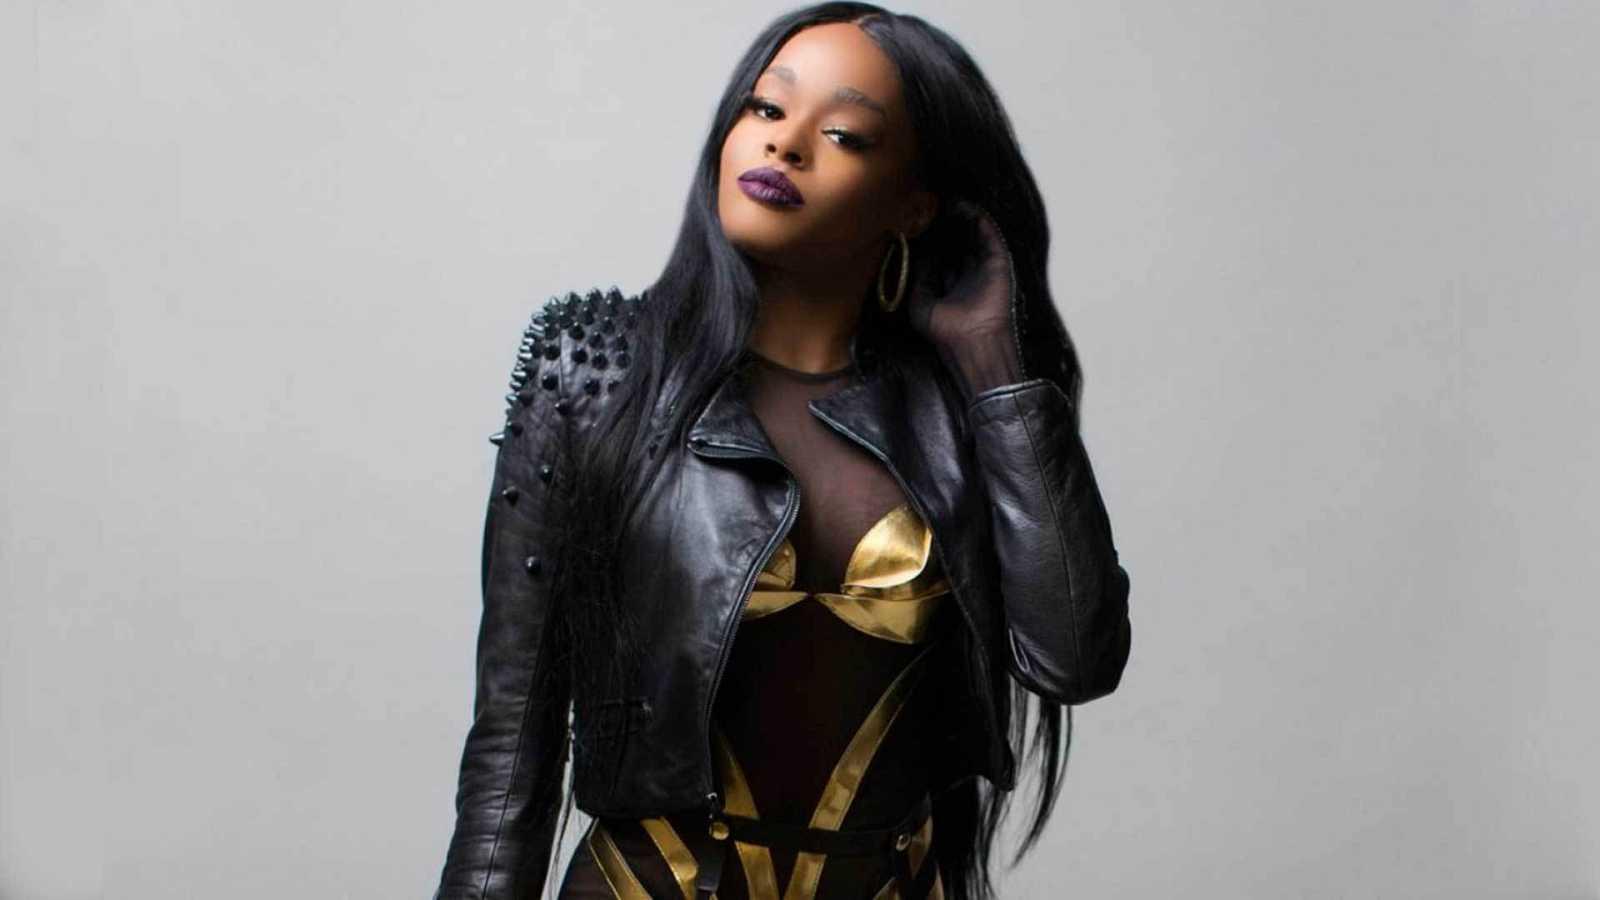 La rapera Azealia Banks